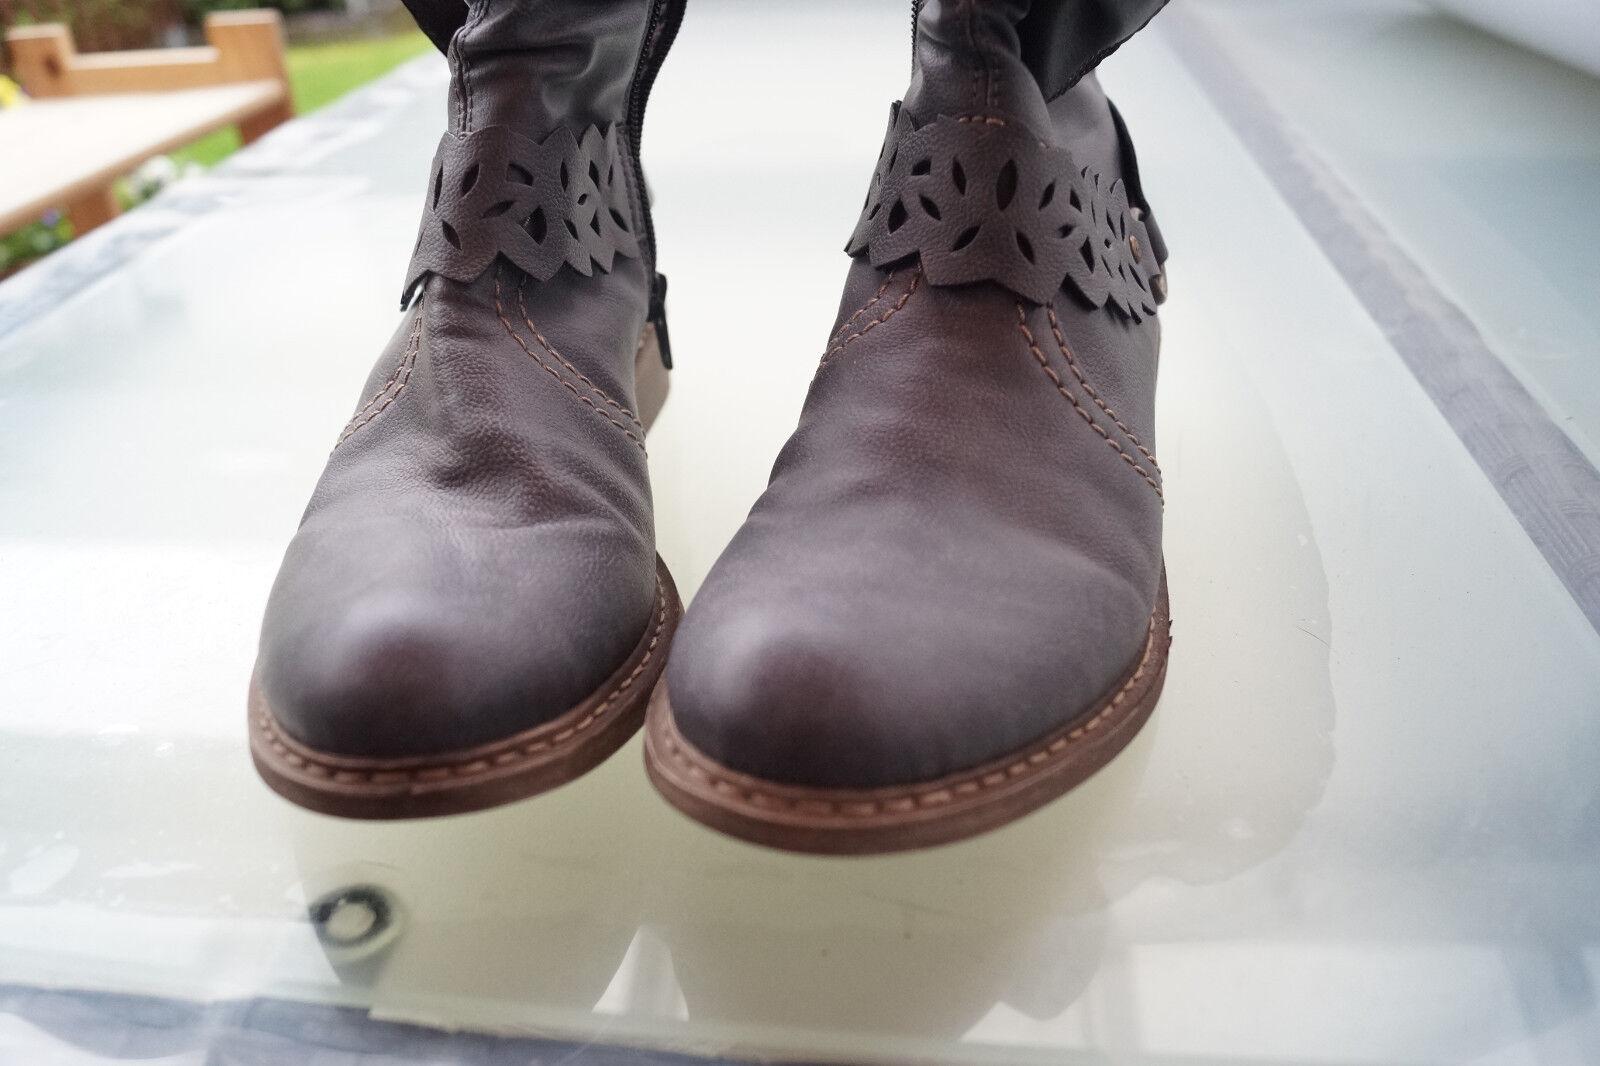 Schicke RIEKER Damen Gr.37 Schuhe Stiefel Stiefel Stiefeletten Gr.37 Damen leicht NEU #m 70b70a